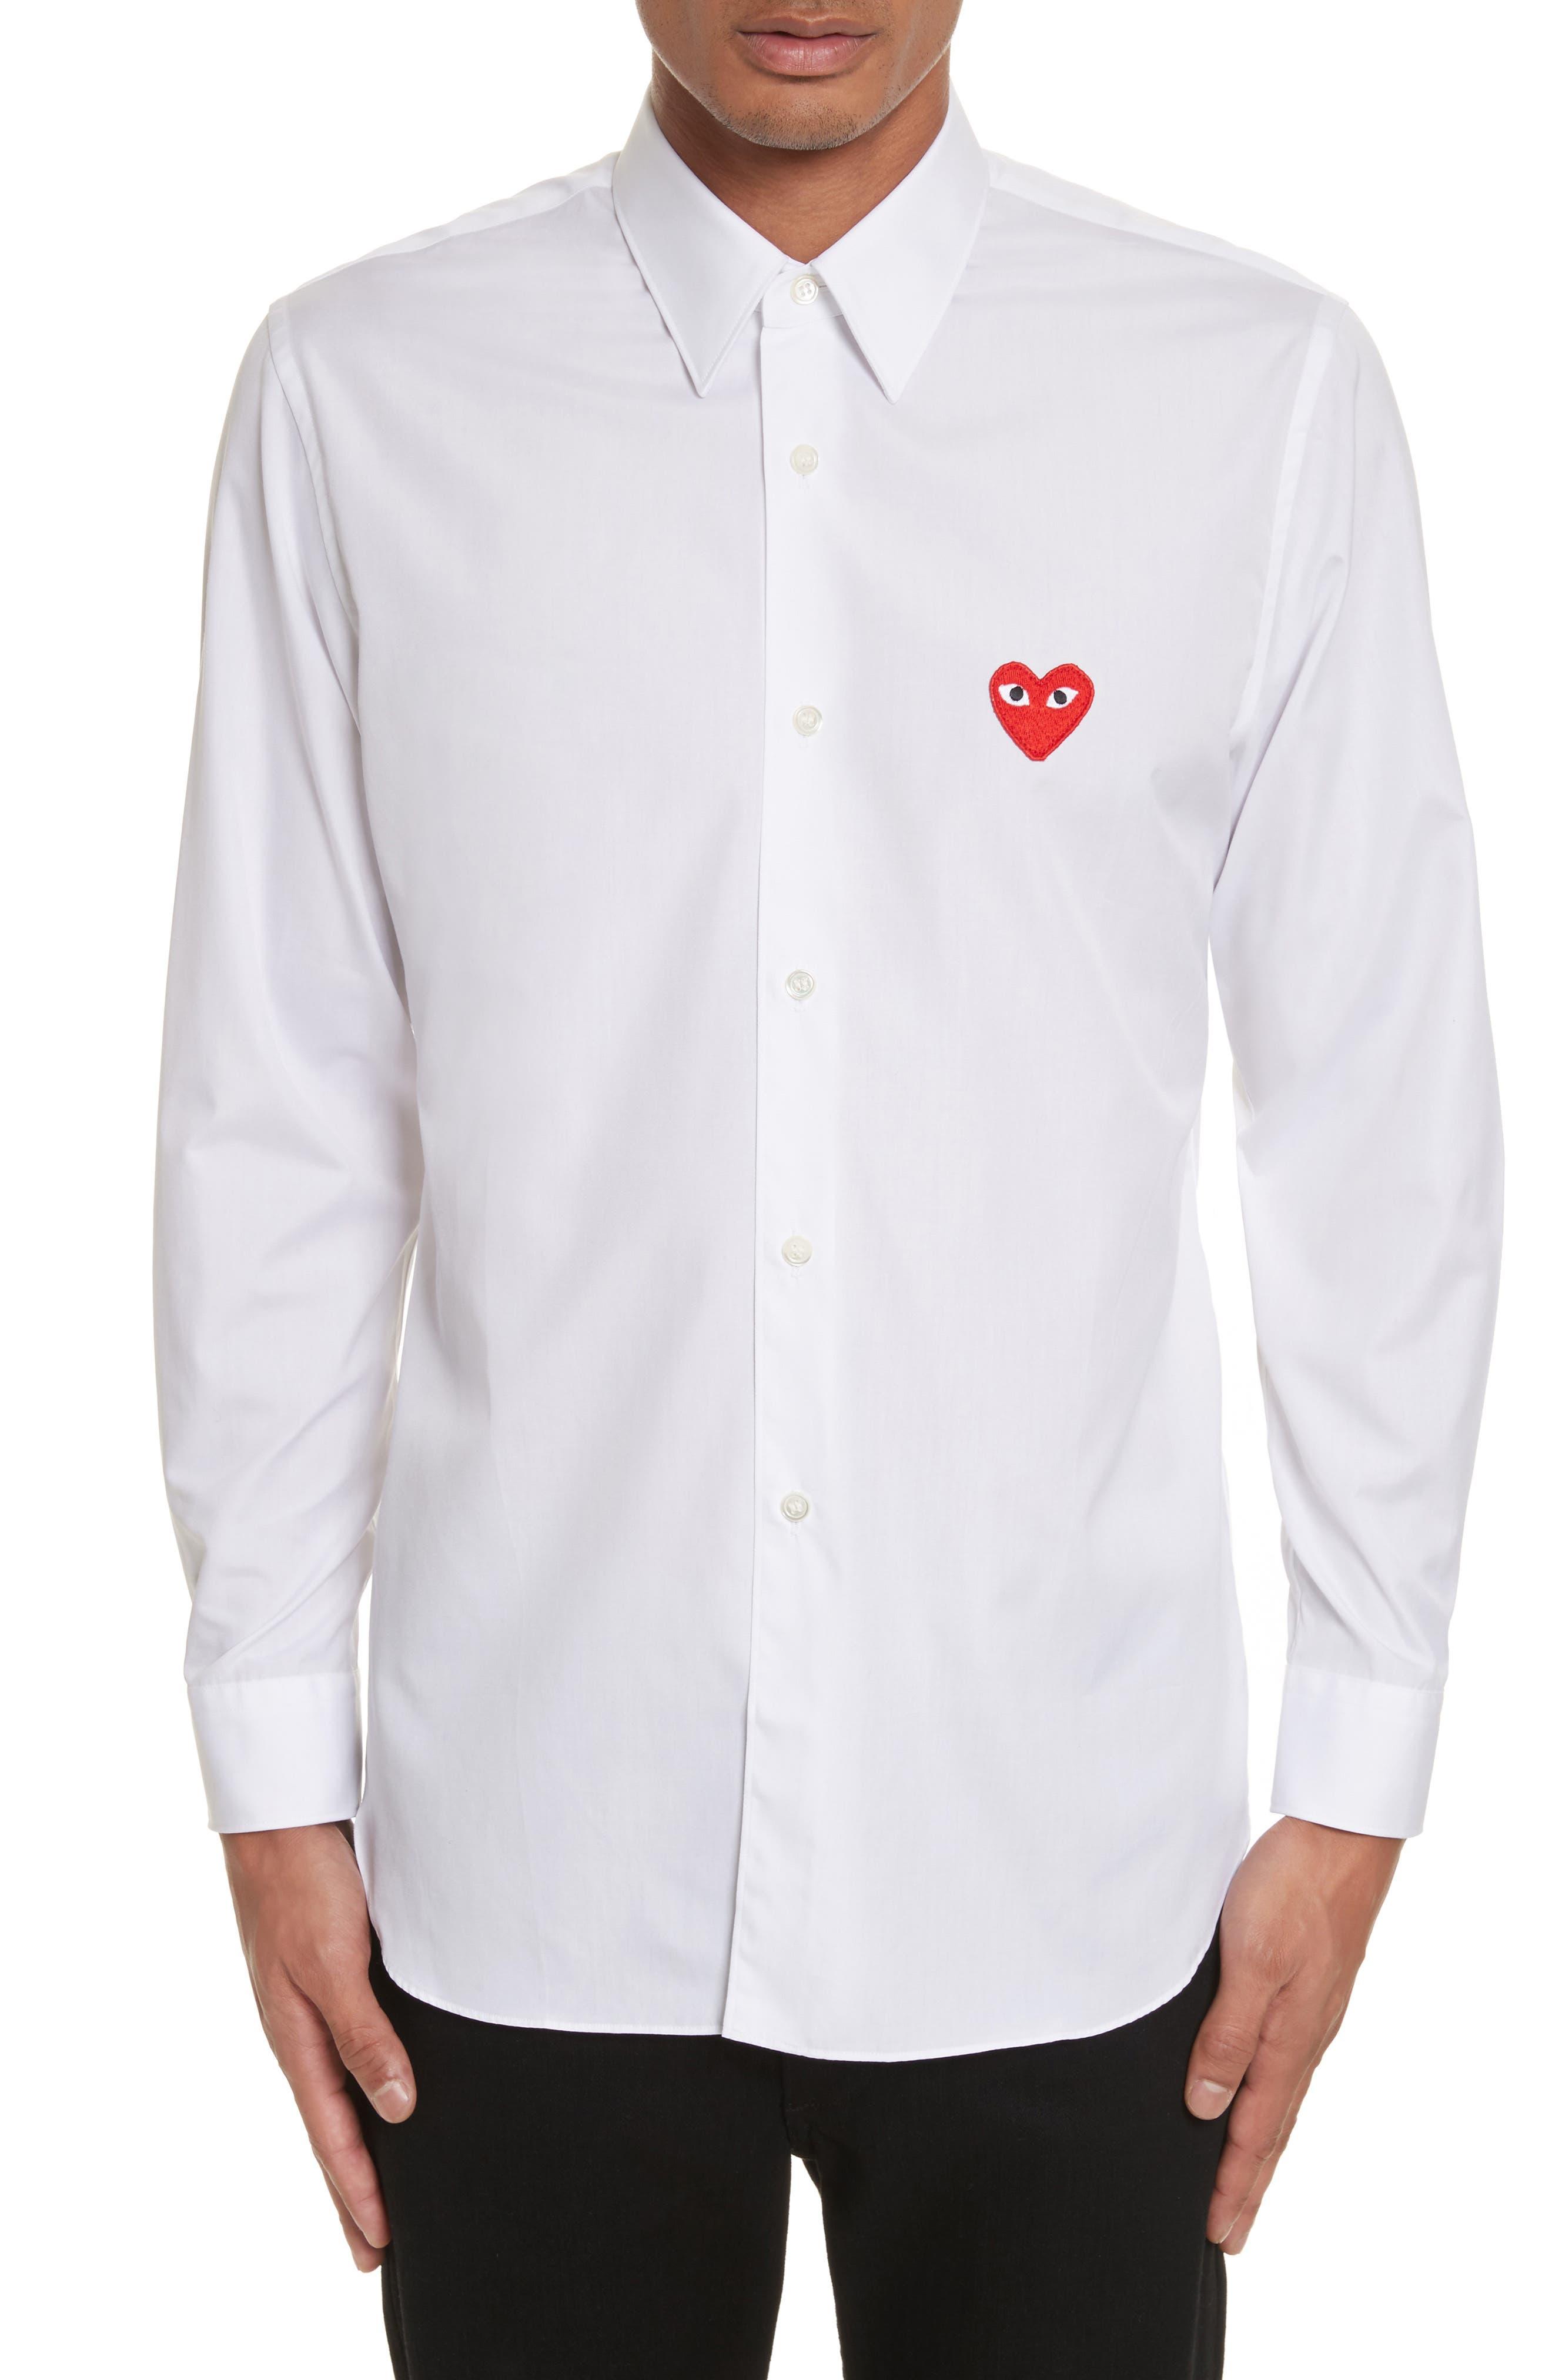 Main Image - Comme des Garçons PLAY Woven Cotton Shirt